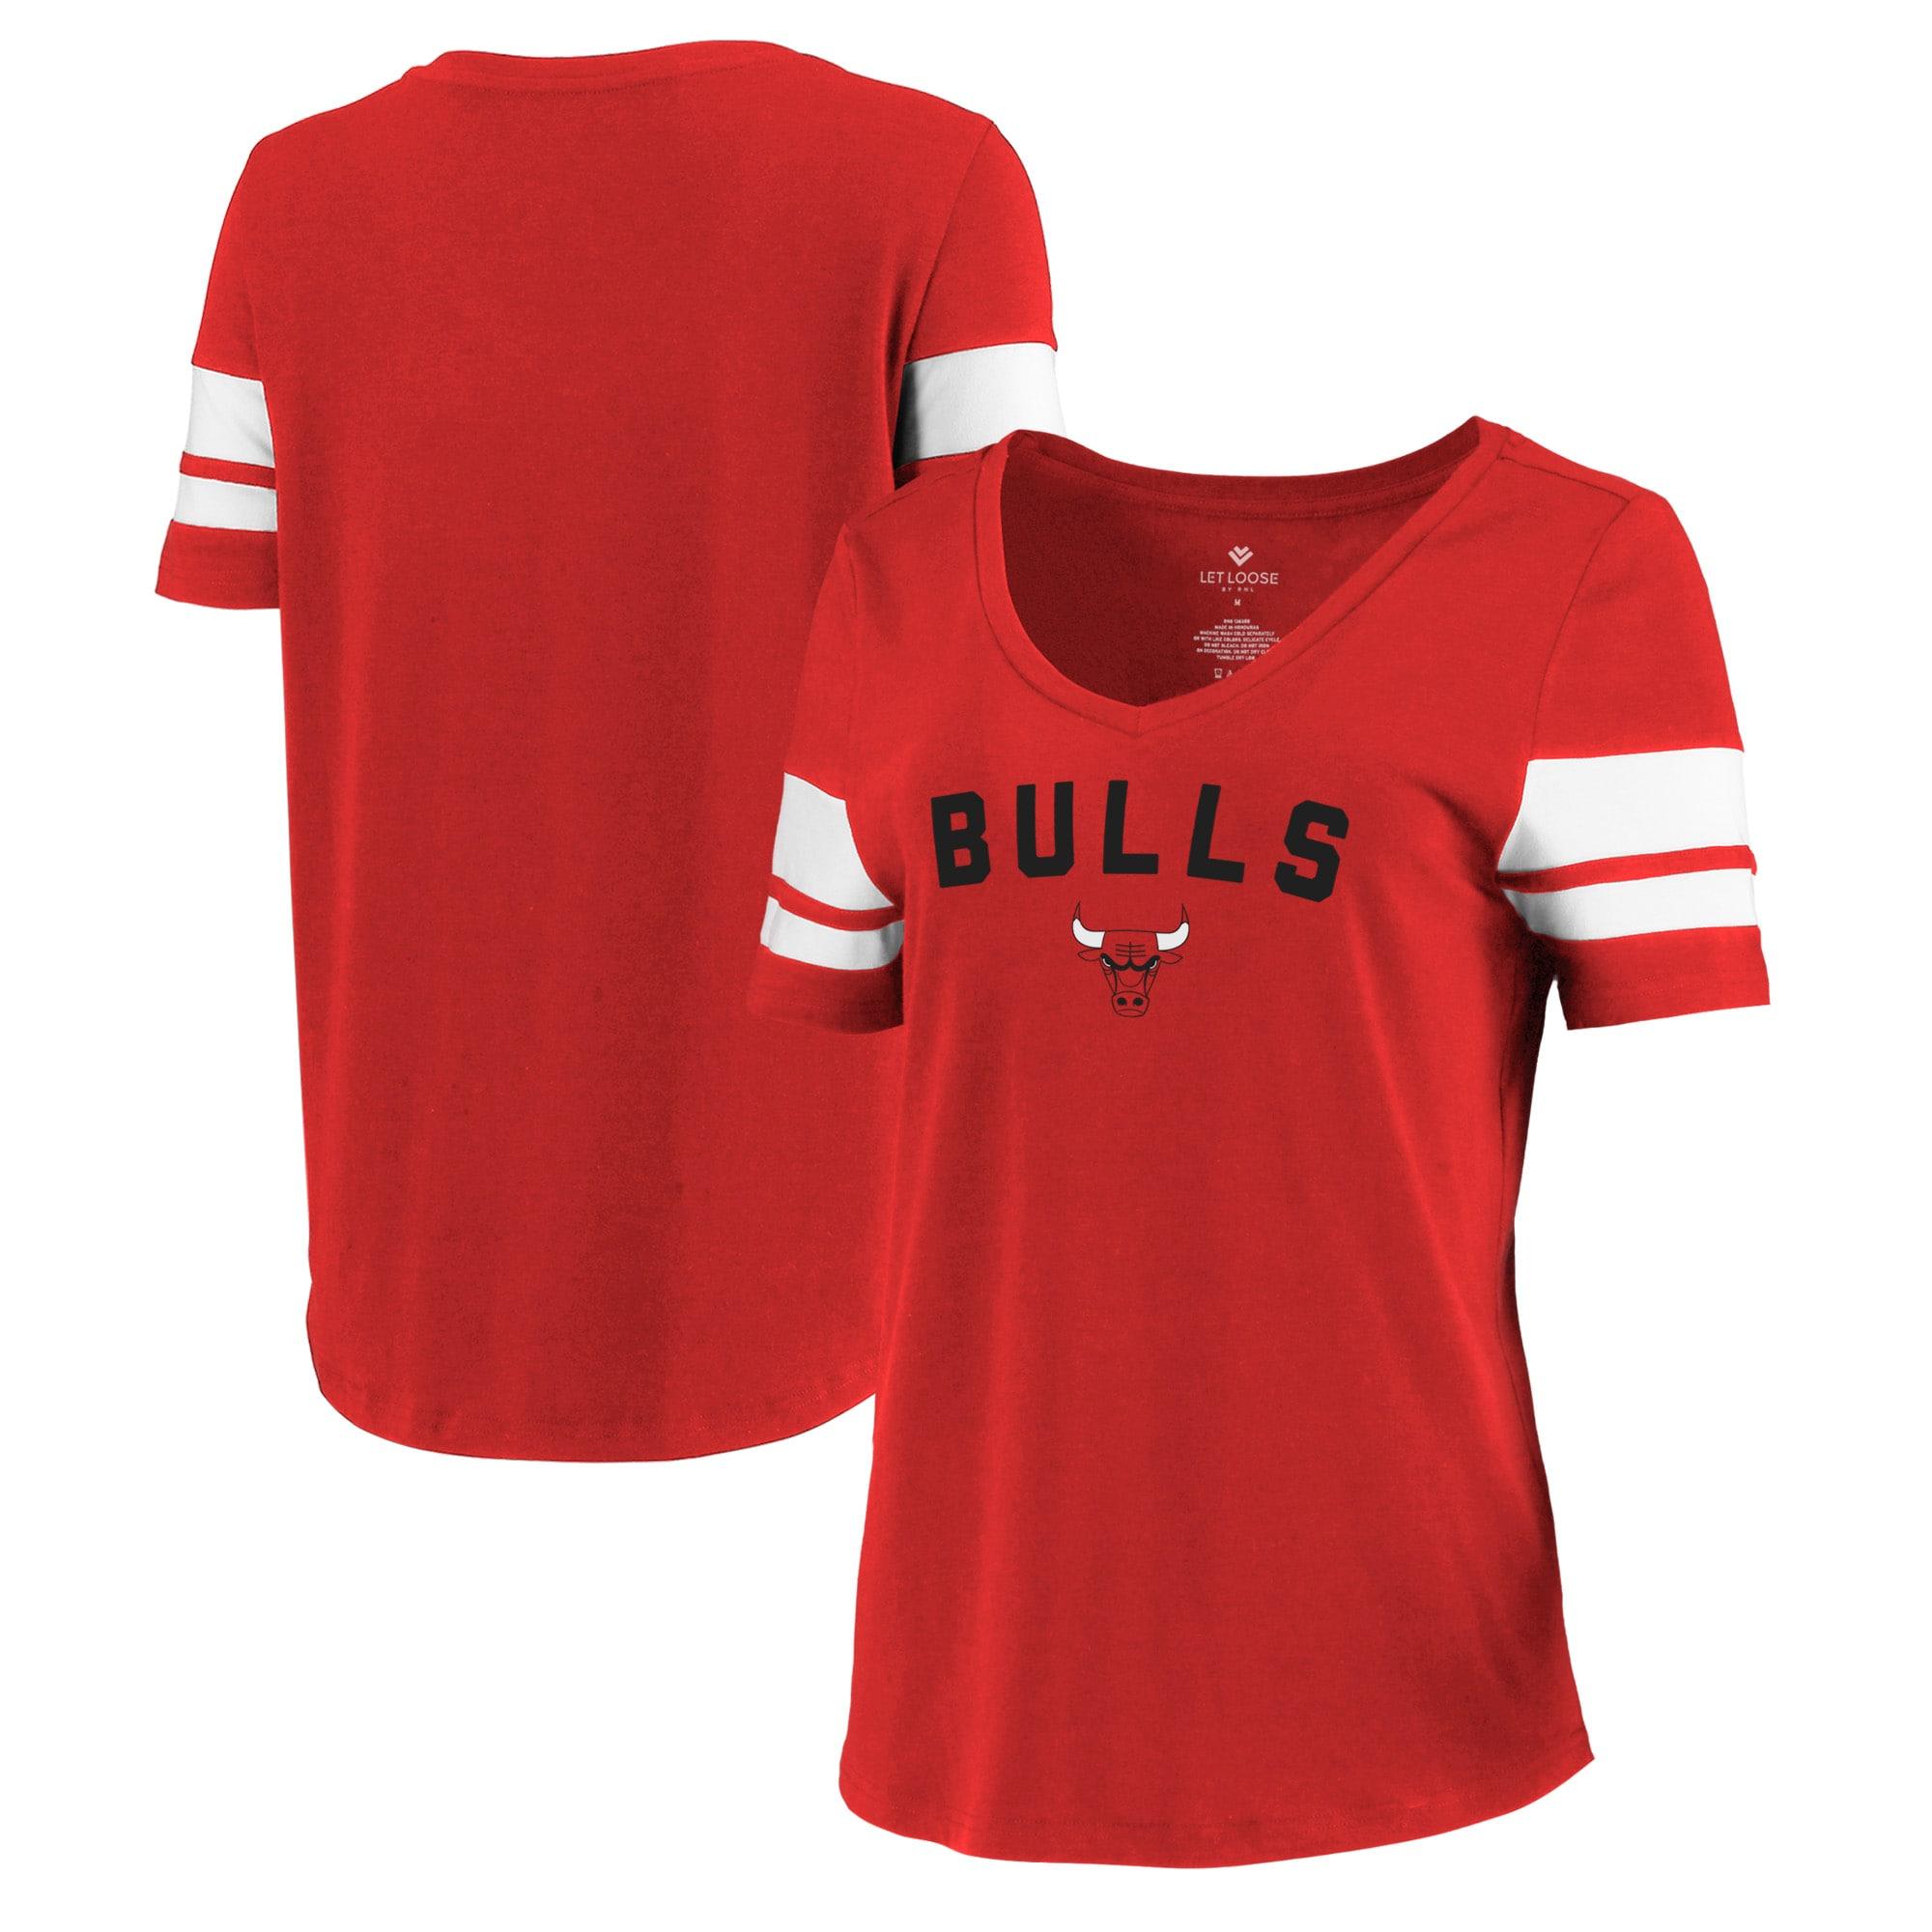 Chicago Bulls Let Loose by RNL Women's Scramble Two Stripe Tri-Blend T-Shirt - Red